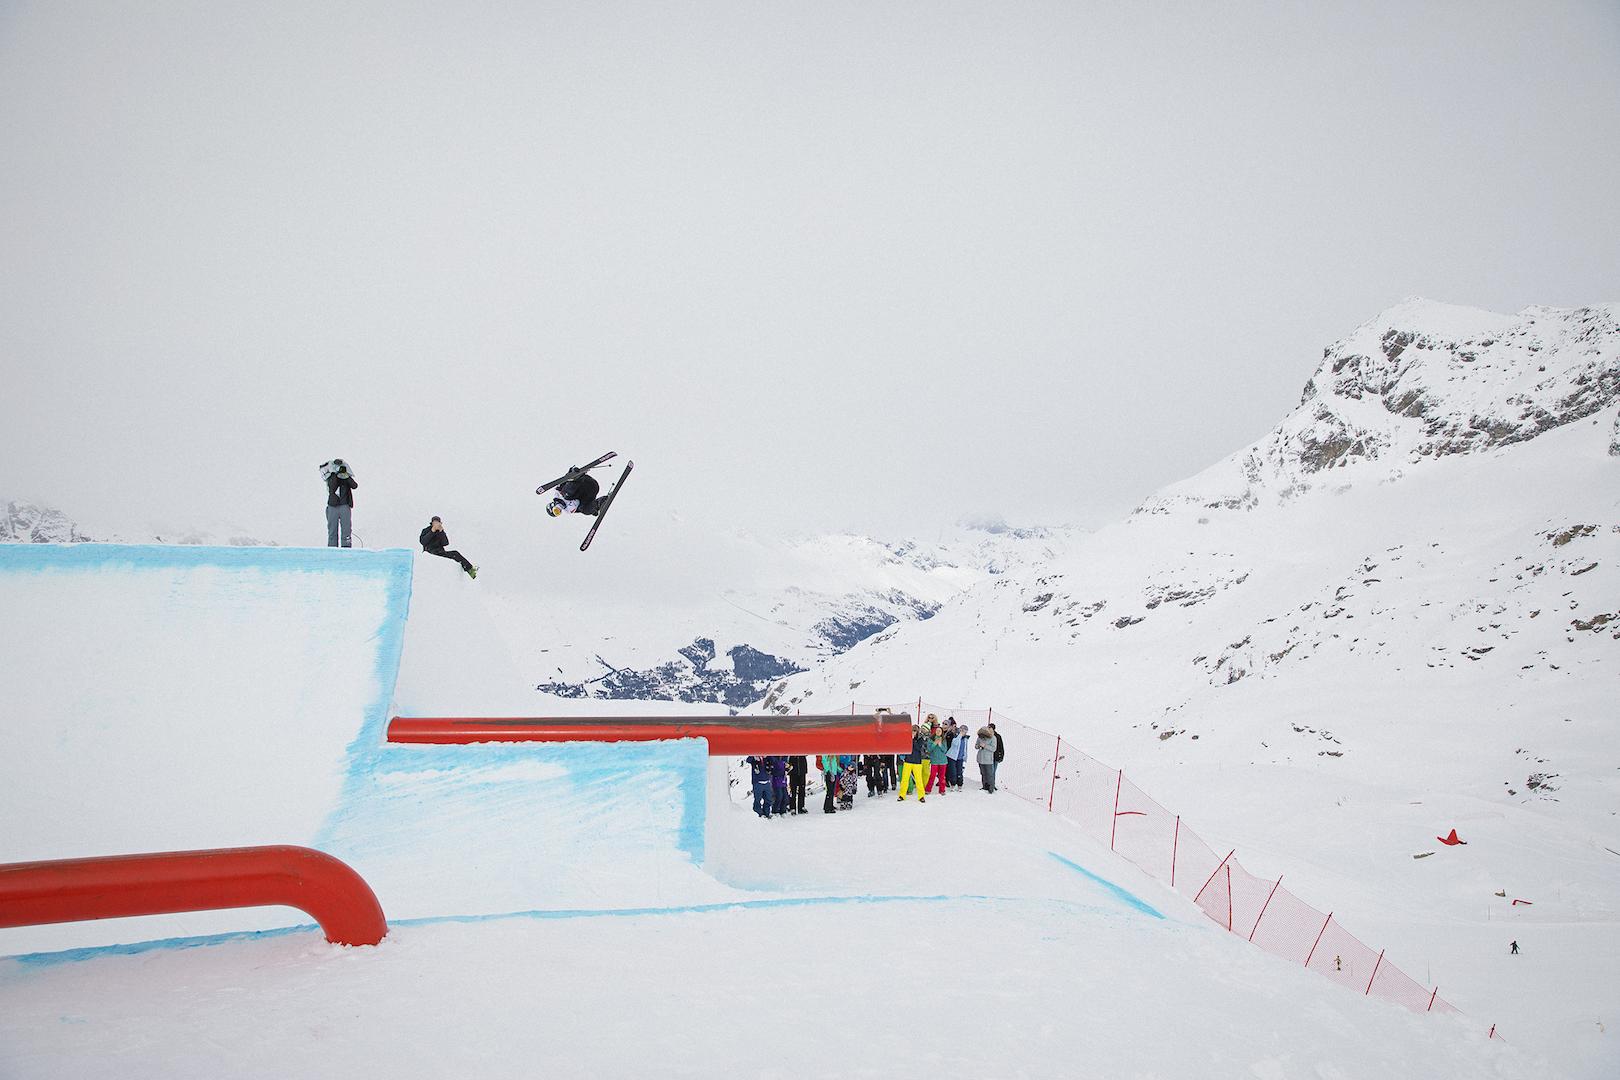 Recap: Freeski World Cup Corvatsch 2018 - SkiingMag